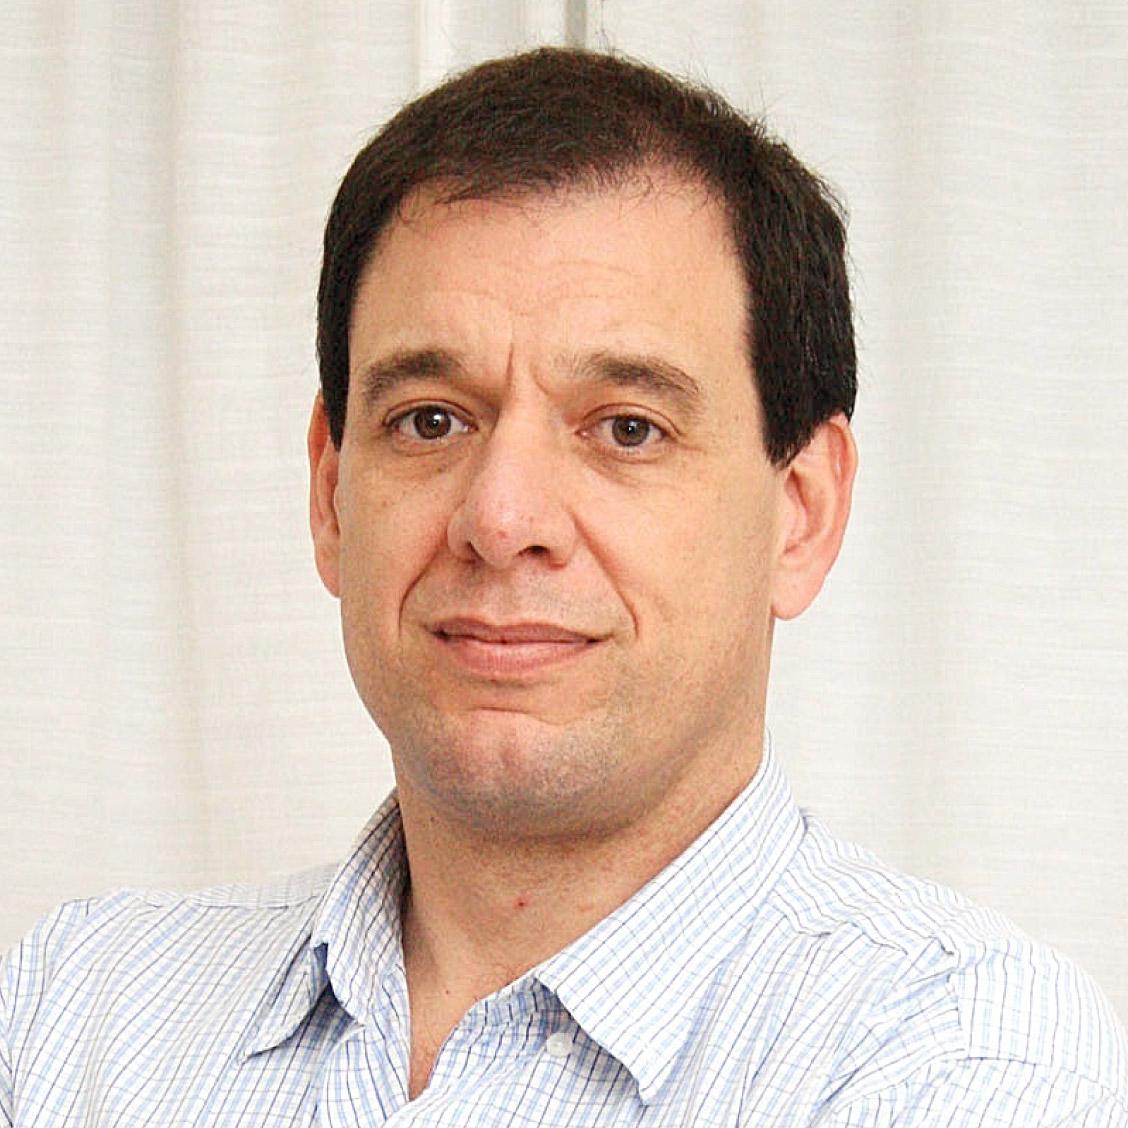 Prof. M.V. Esp. Pablo José Manzuc